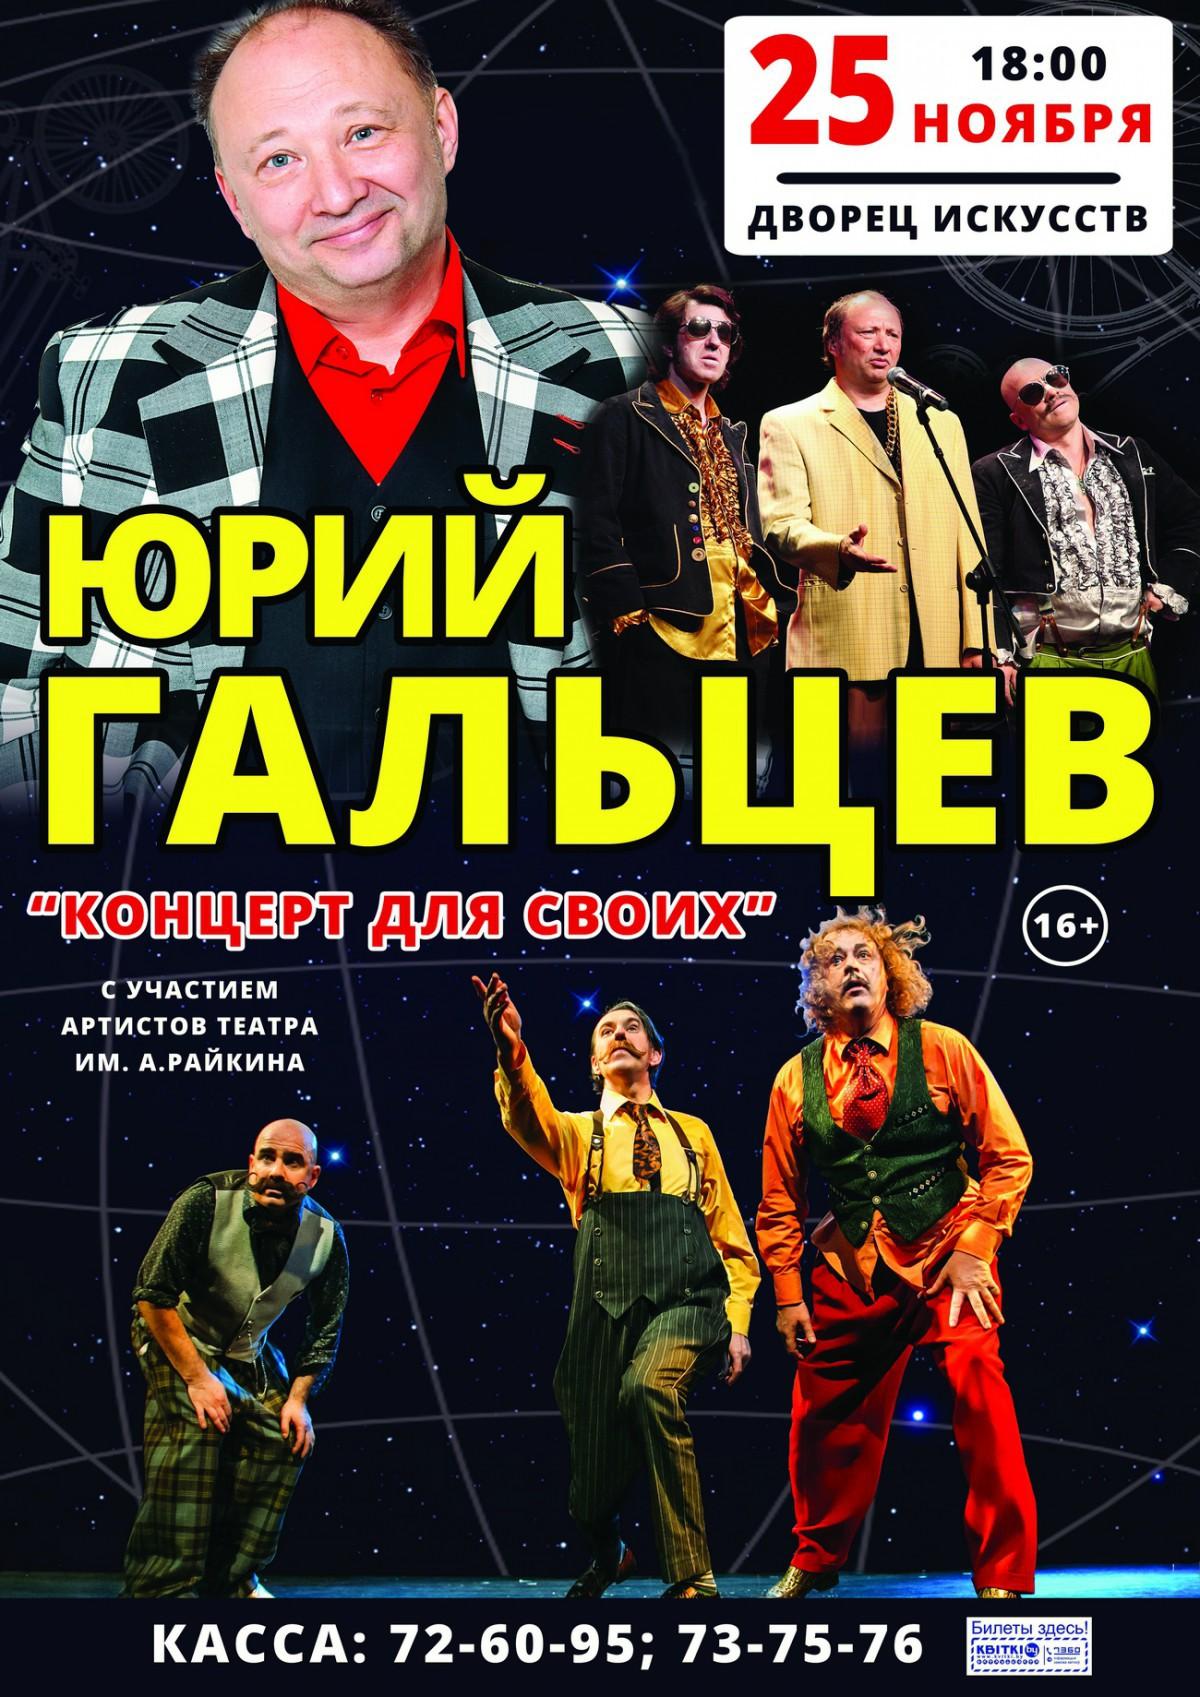 Шоу-программа Юрия Гальцева «Концерт для своих!»